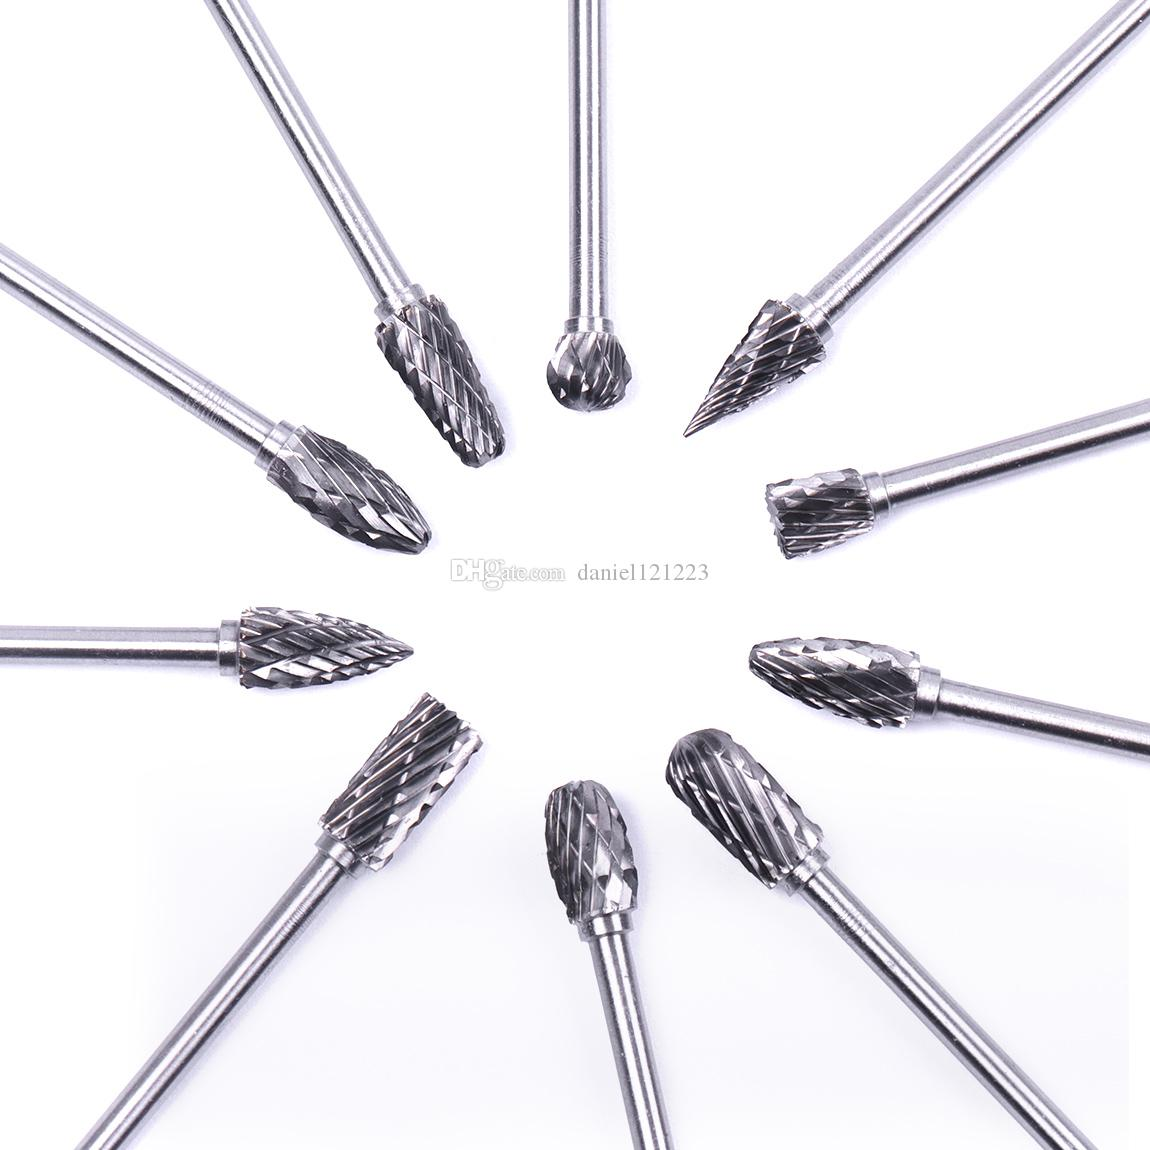 Dremel Carbide Burrs Drill Bit Set Rotary Burr Micro Drill Bits for Metal Woodworking Carving Tool Glass Diamond